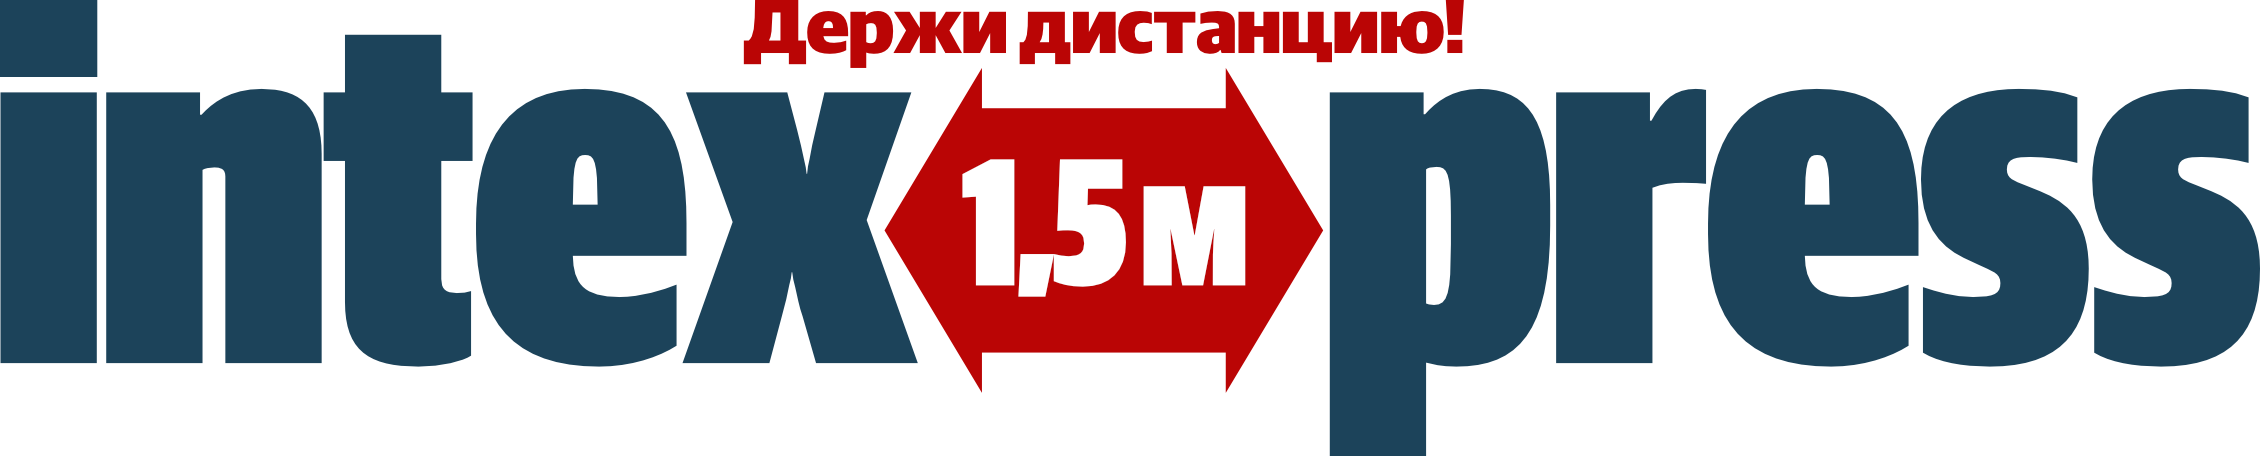 Новости Барановичей, Бреста, Беларуси и Мира. Intex-press